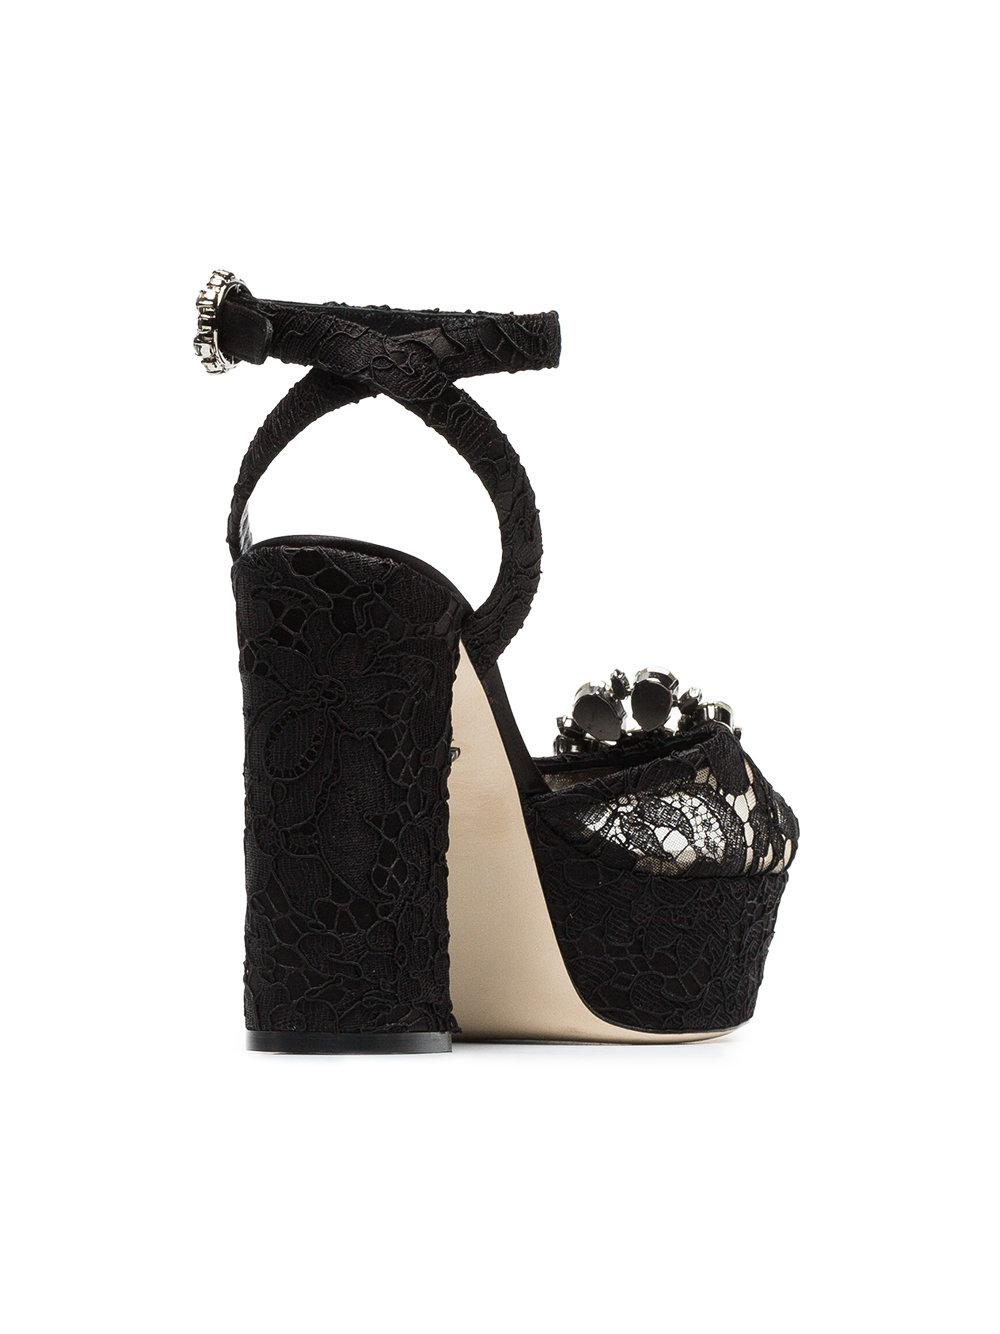 à écran plein amp; Afficher Sandales Keira Lyst plateforme Black 130 en Gabbana Dolce xHIqdP7H